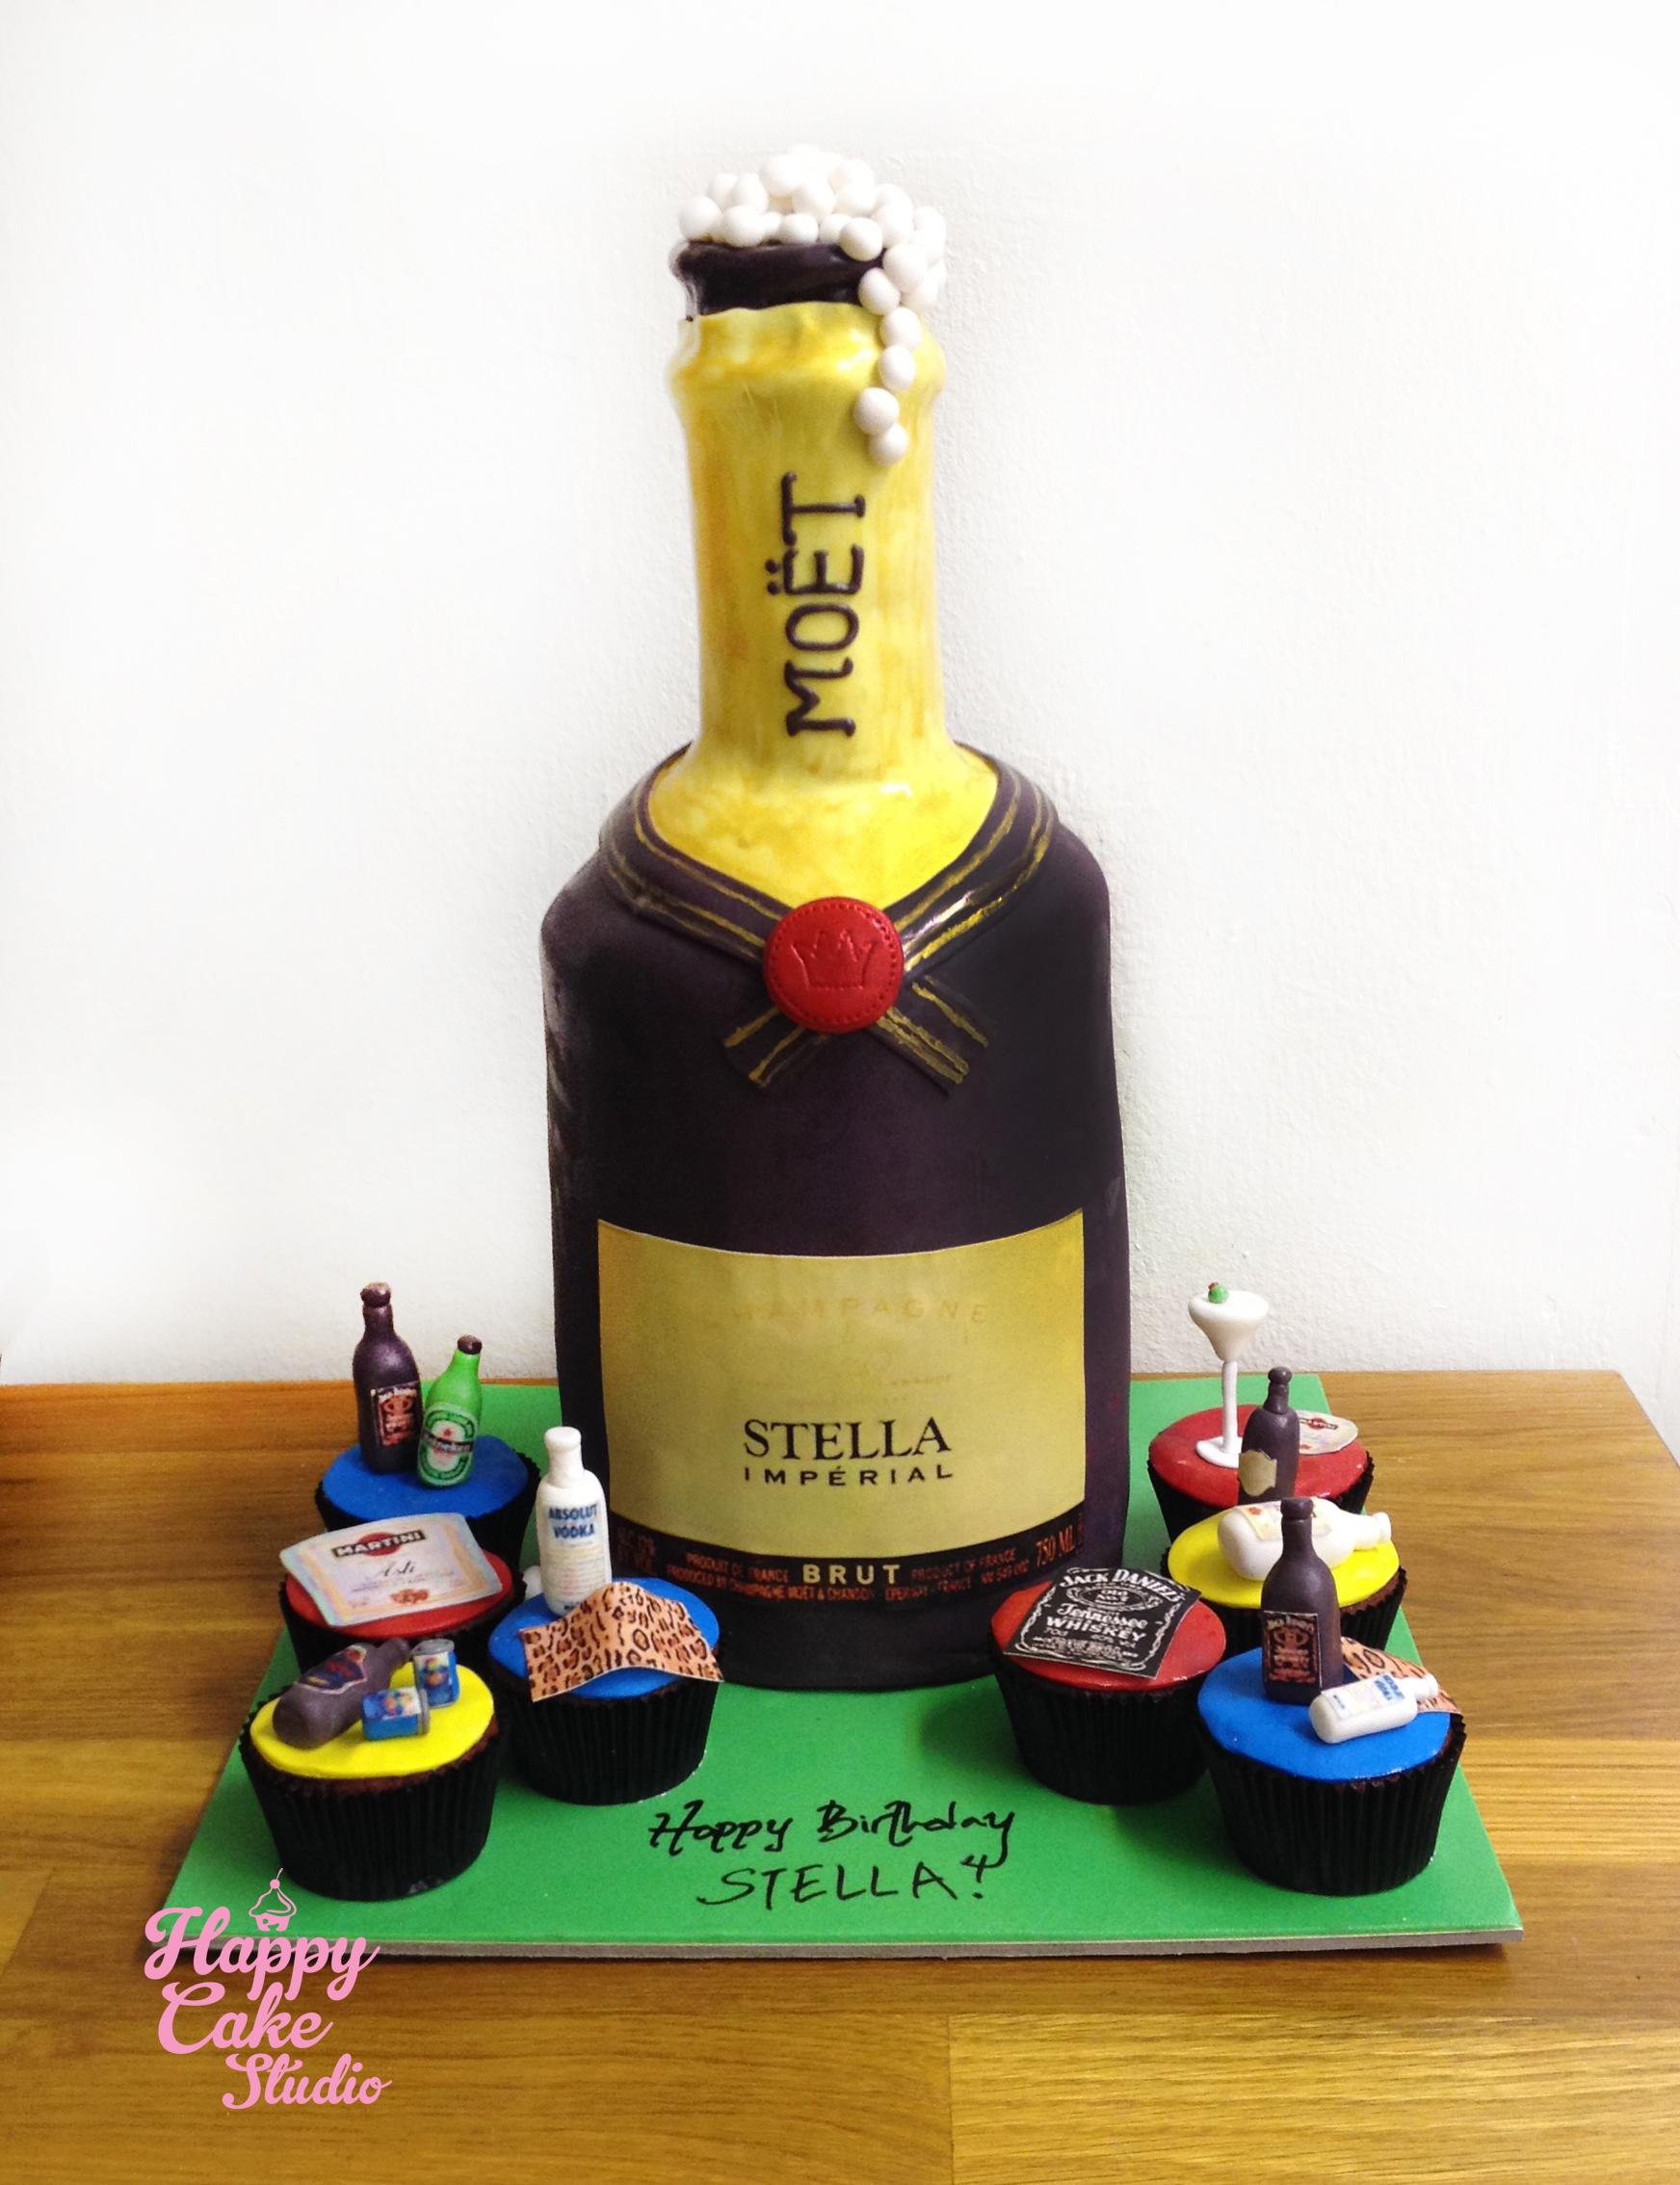 Astonishing 10 Alcohol Birthday Cakes 3D Photo Happy Birthday Alcohol Cakes Funny Birthday Cards Online Necthendildamsfinfo